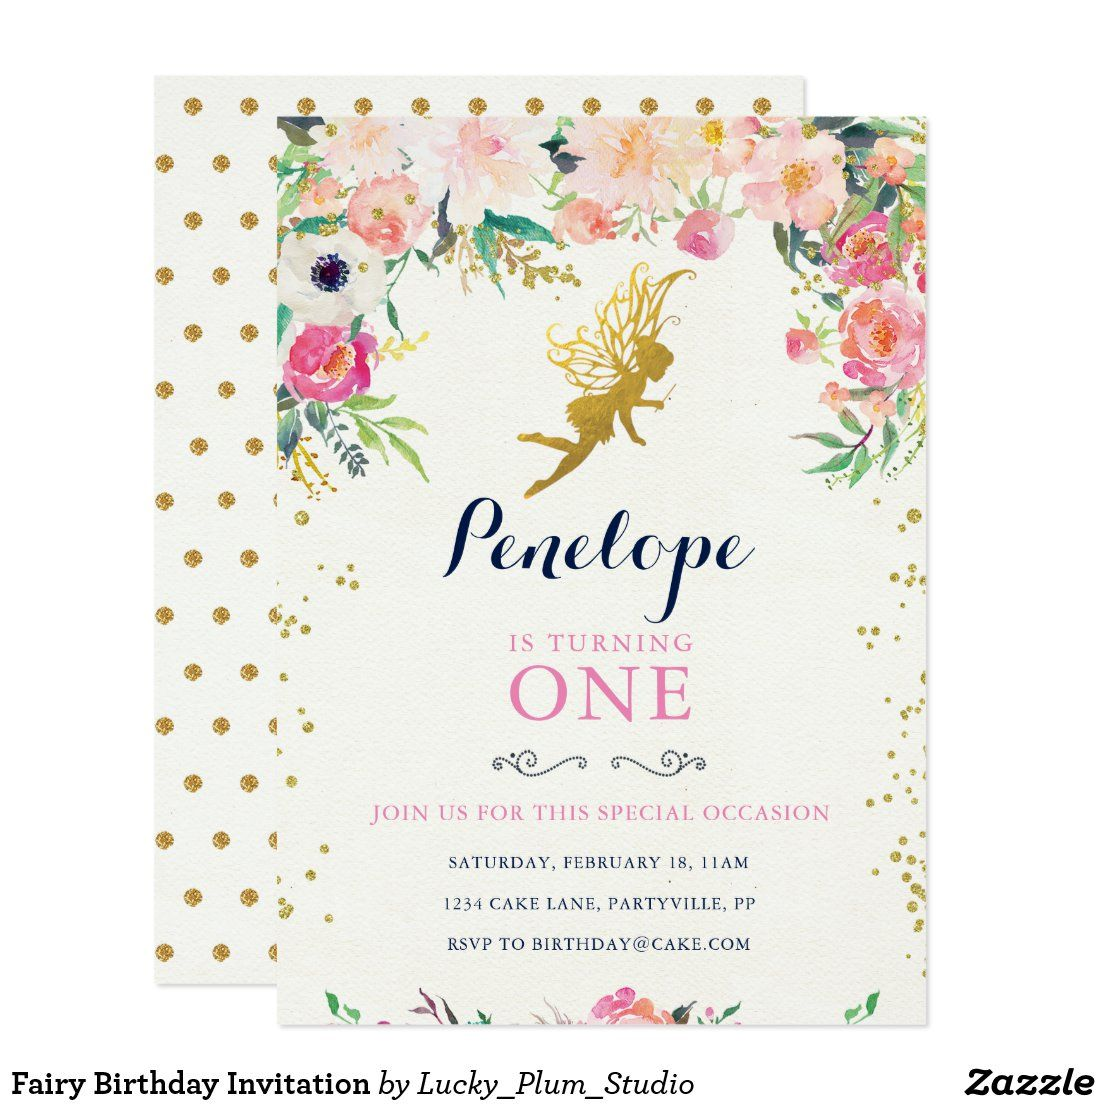 Fairy Birthday Invitation in 2020 Butterfly